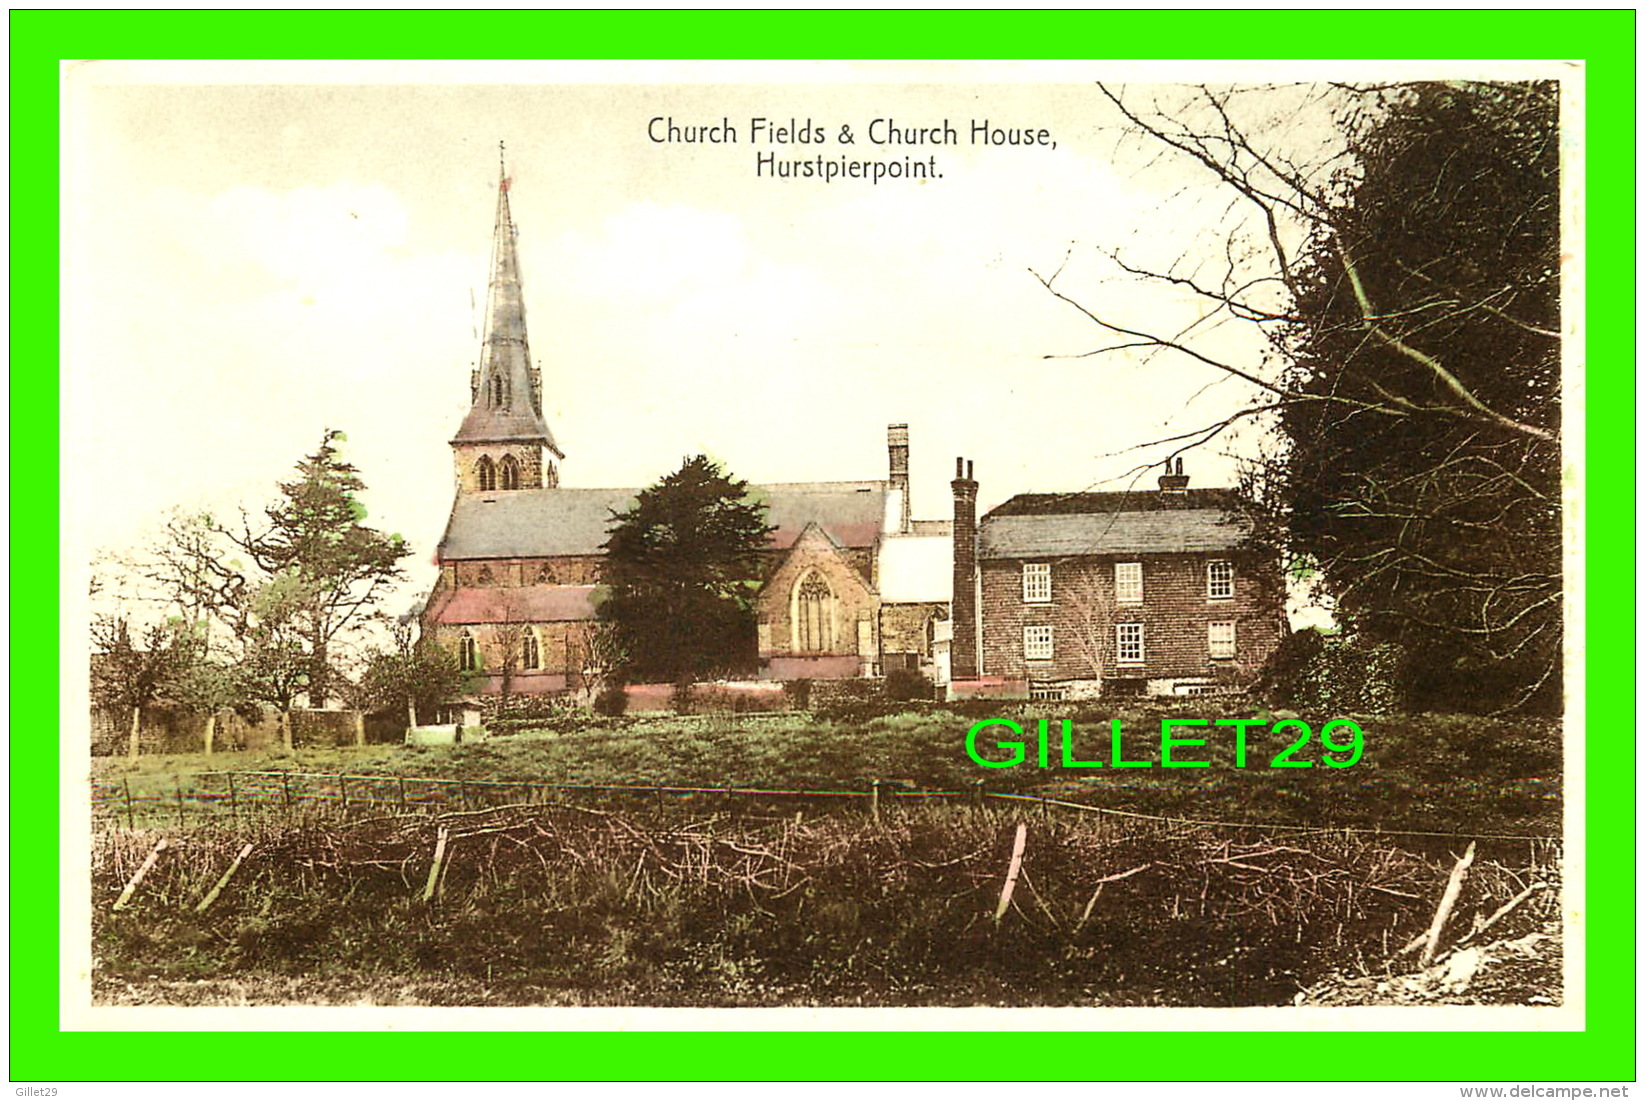 HURSTPIERPOINT, UK - CHURCH FIELDS & CHURCH HOUSE - - Angleterre